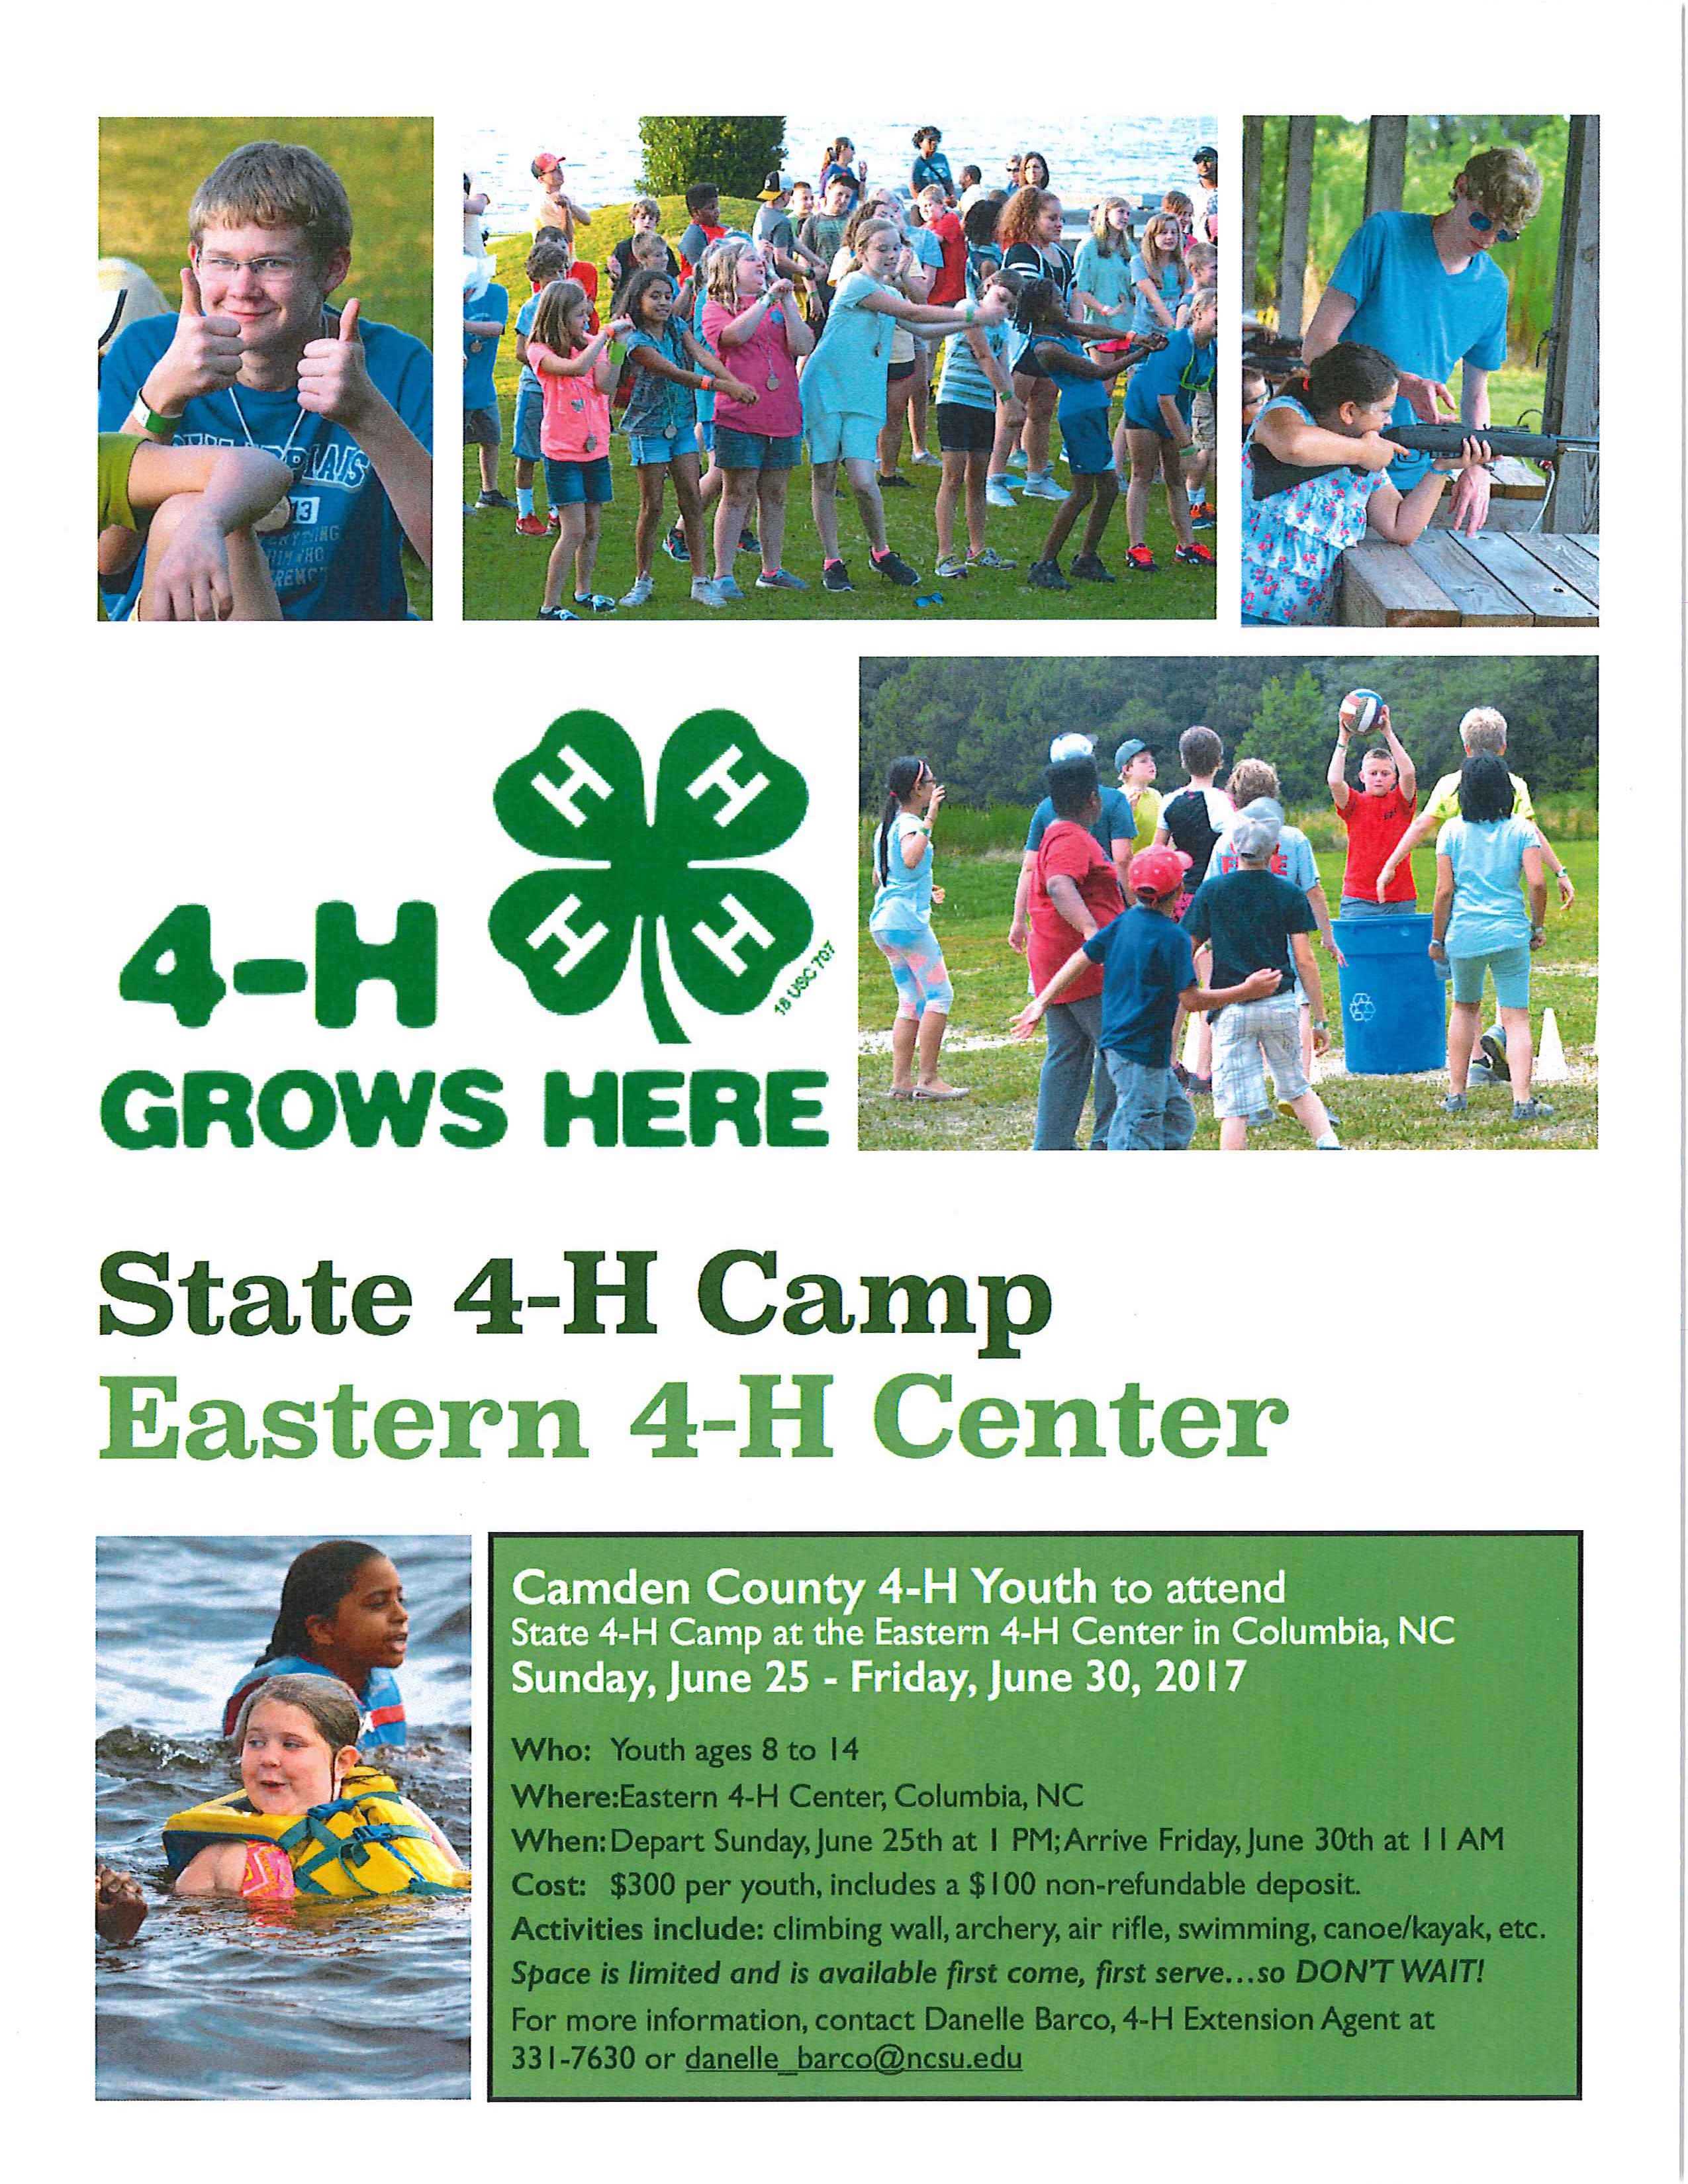 State 4-H Camp Eastern 4-H Center flier